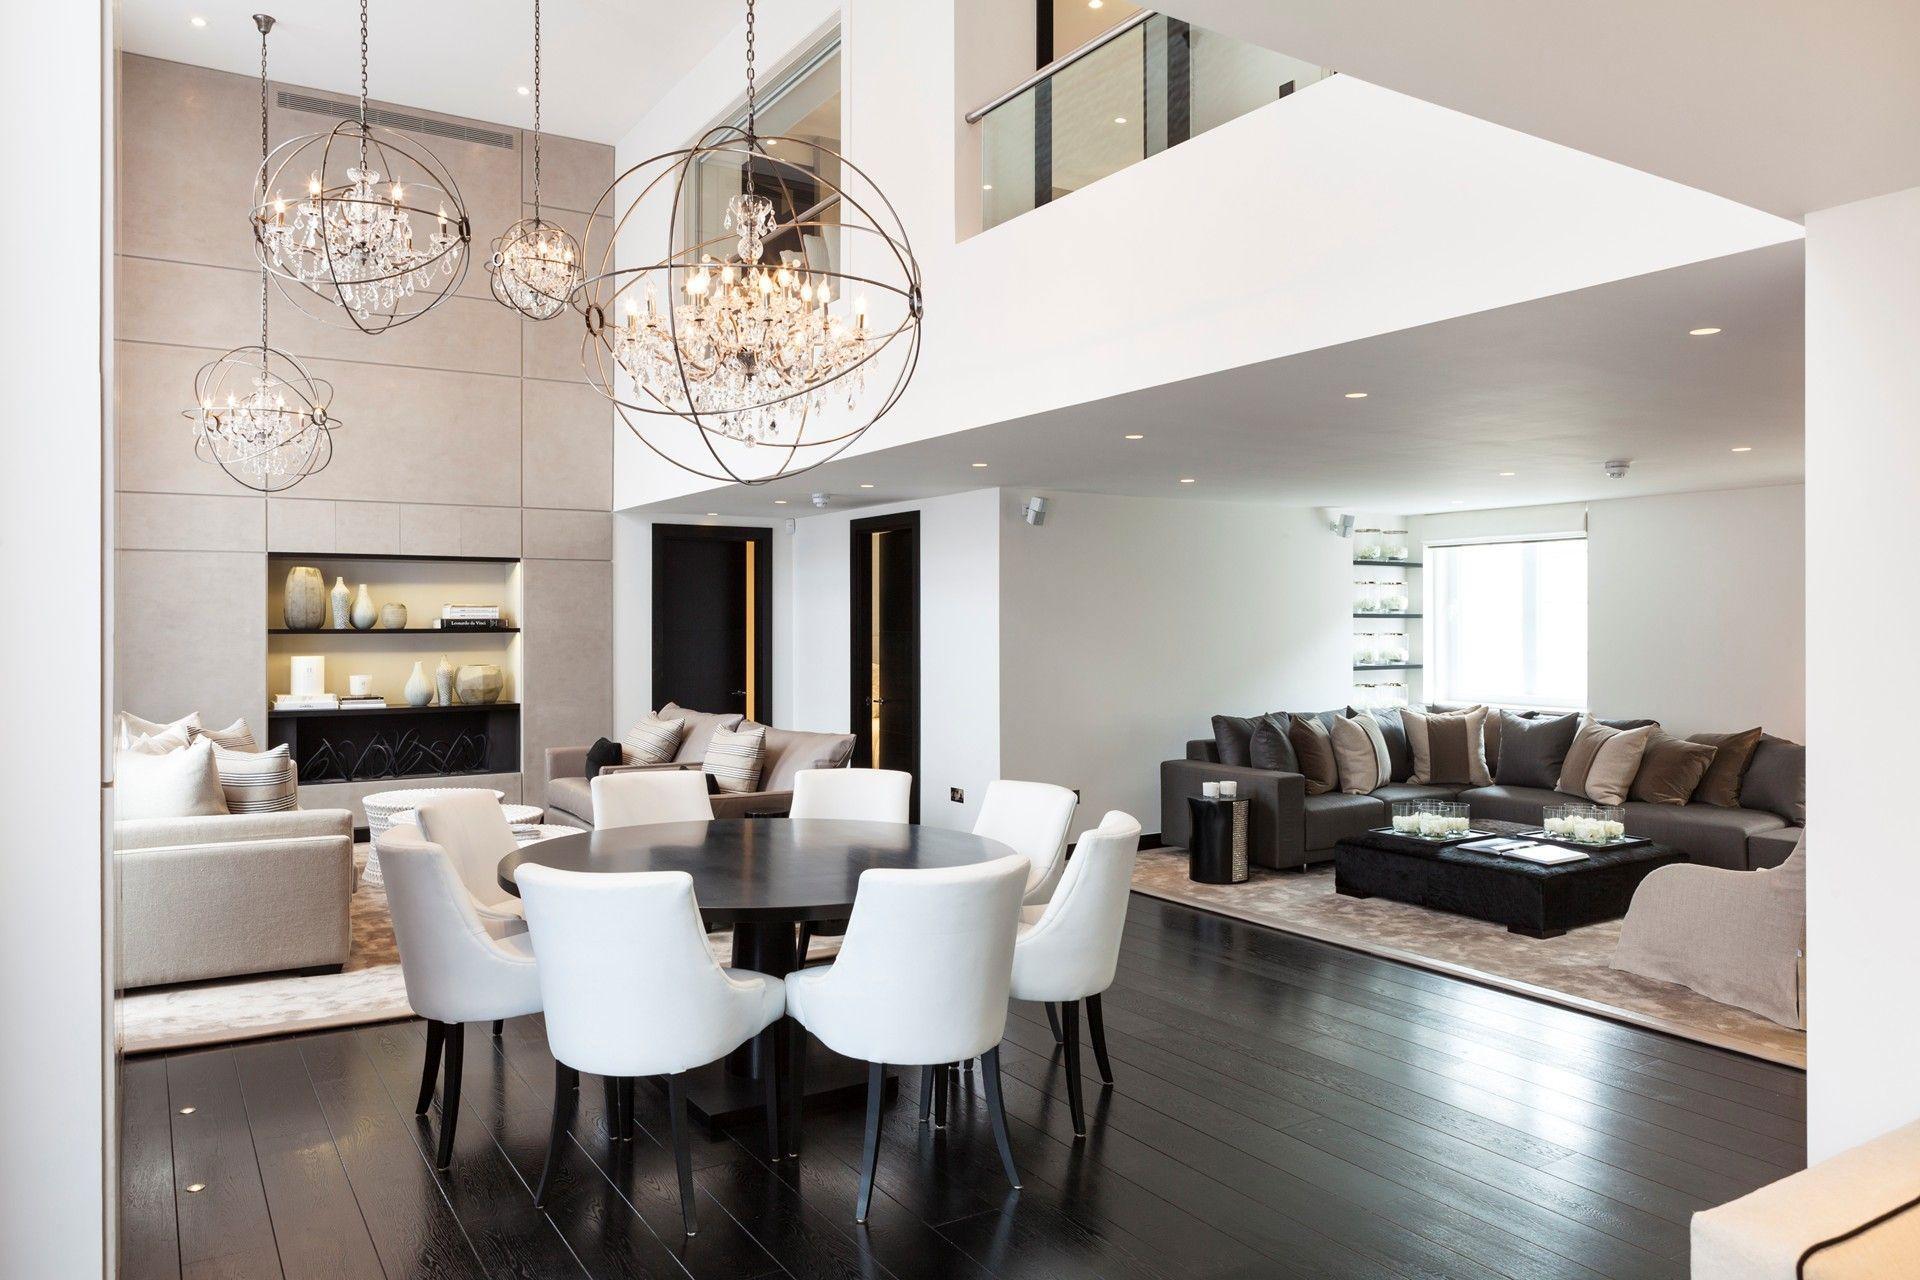 Elegant chandeliers dining table living space open plan henrietta street apartment